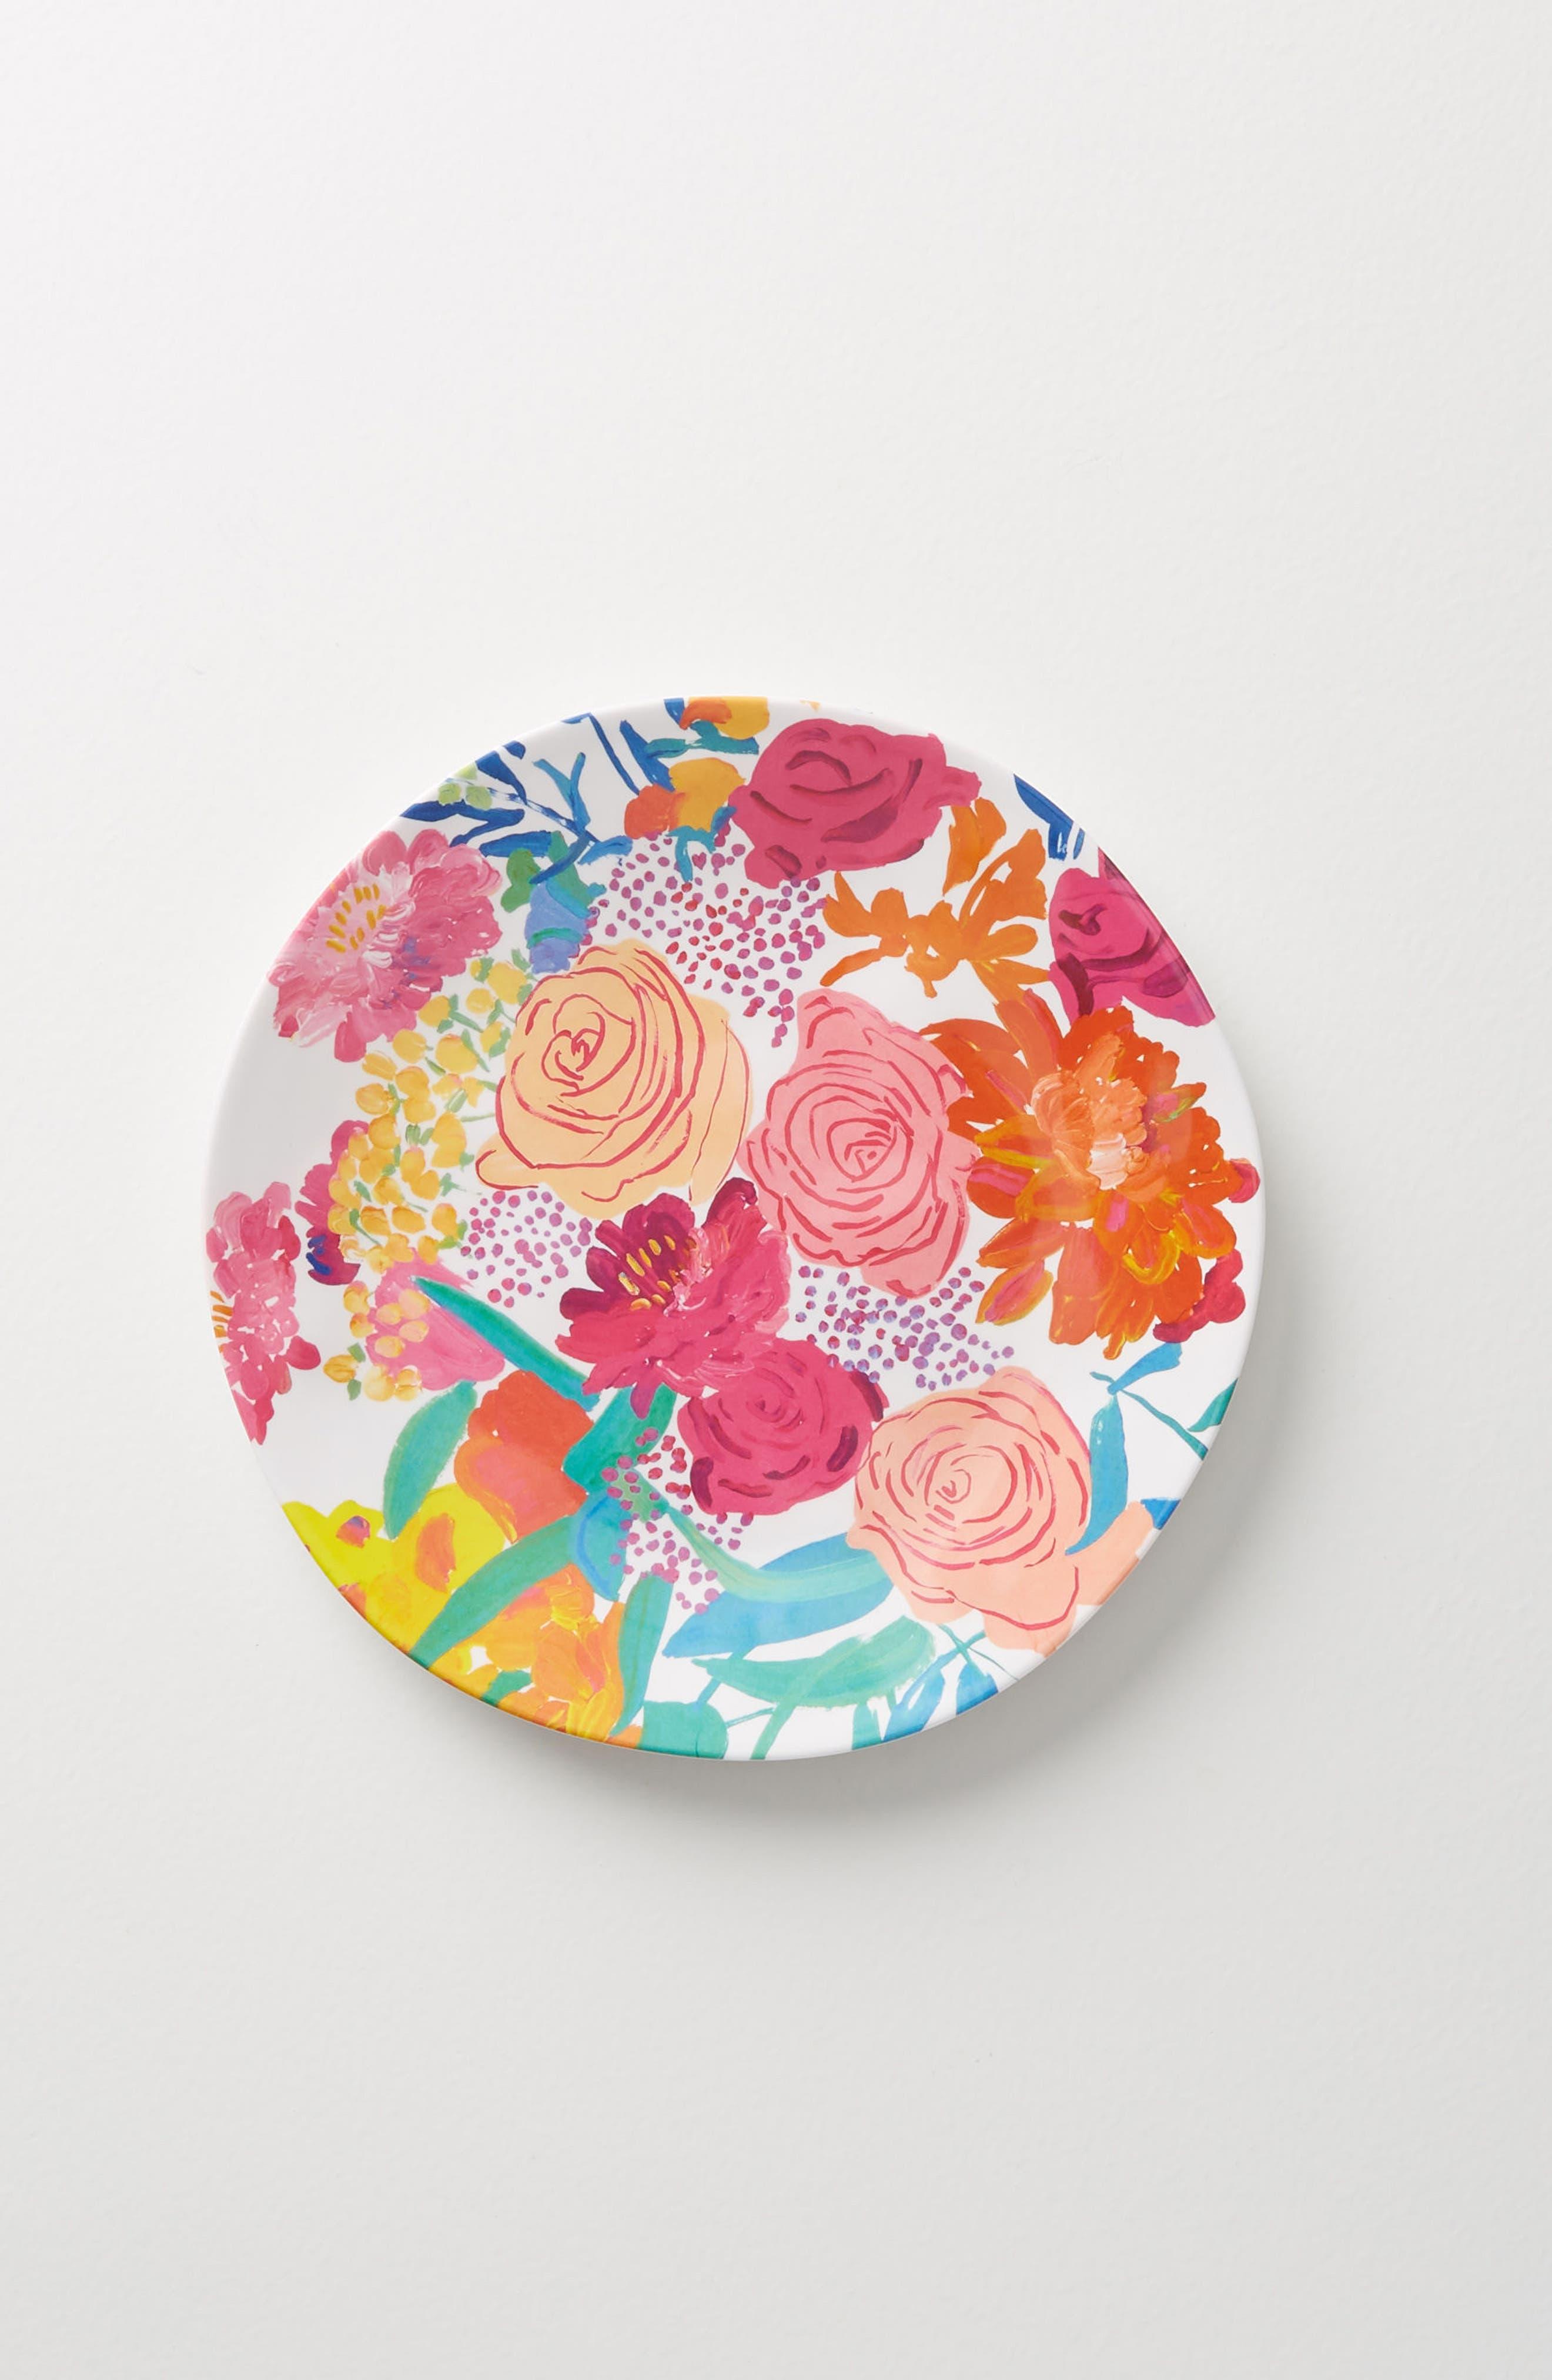 Anthropologie Paint + Petals Melamine Plate & Pink Dinner Plates Dinnerware: Dishes Plates \u0026 Bowls | Nordstrom